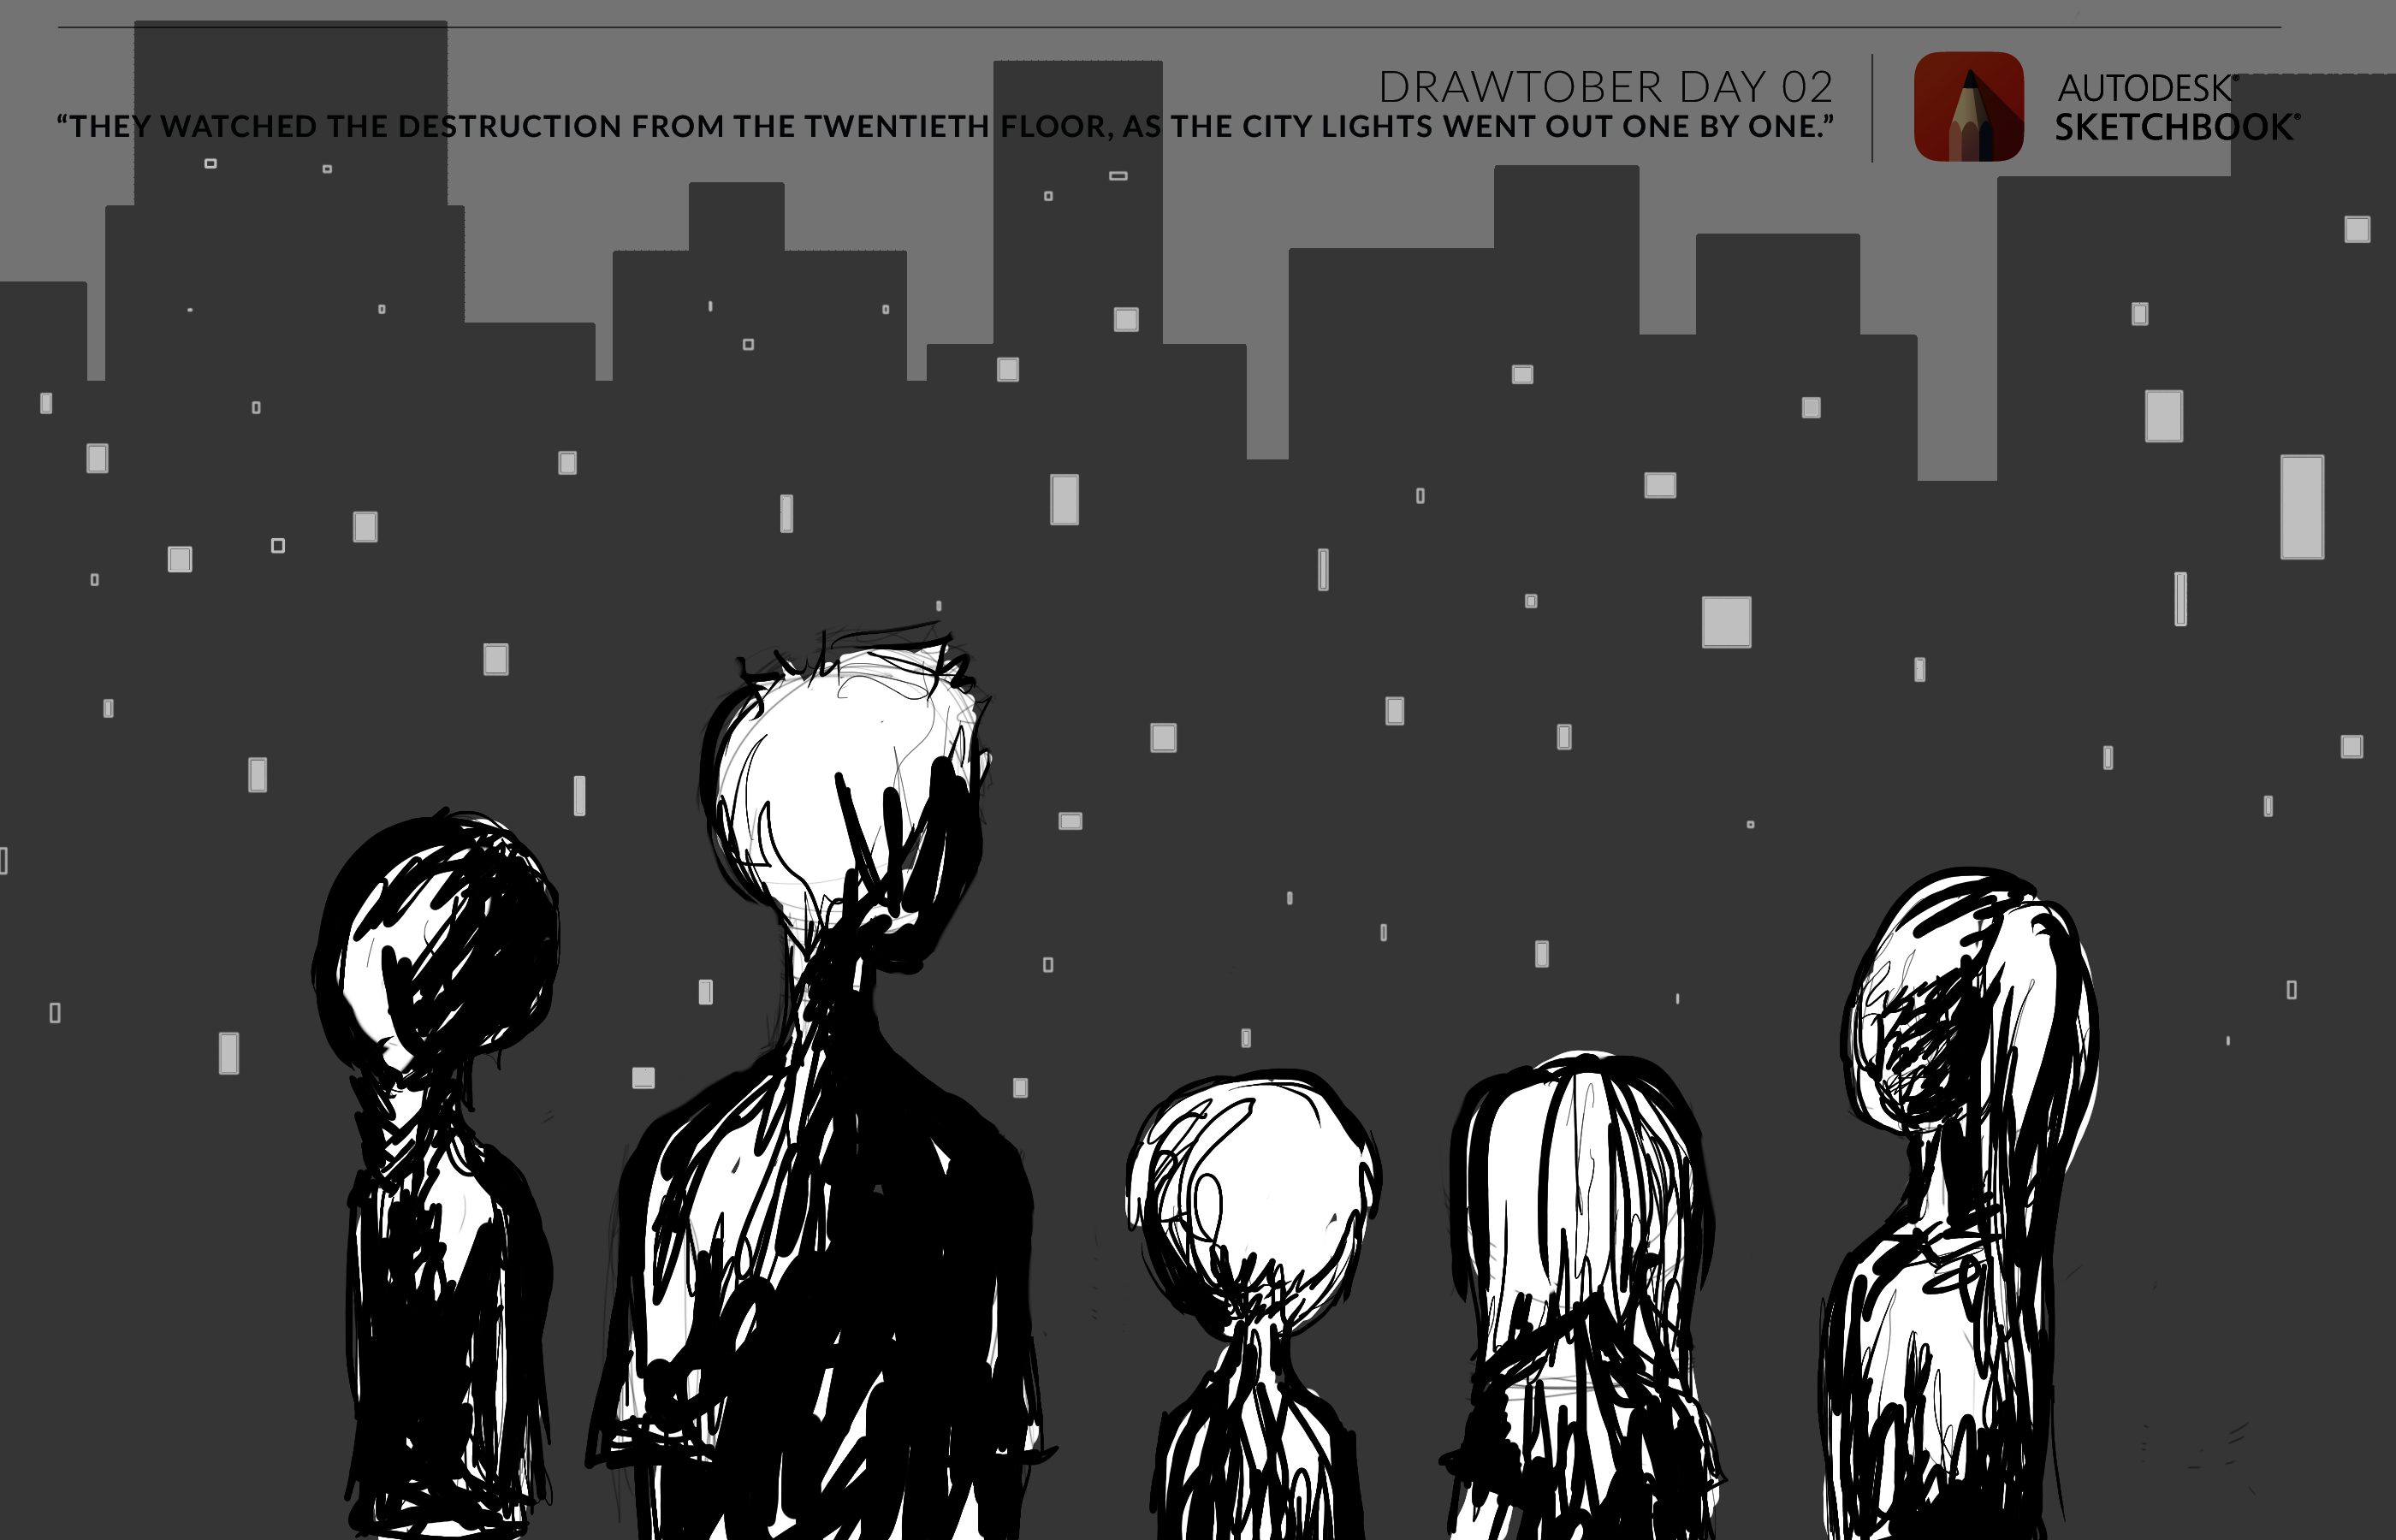 Drawtober 2 by shannanapeels